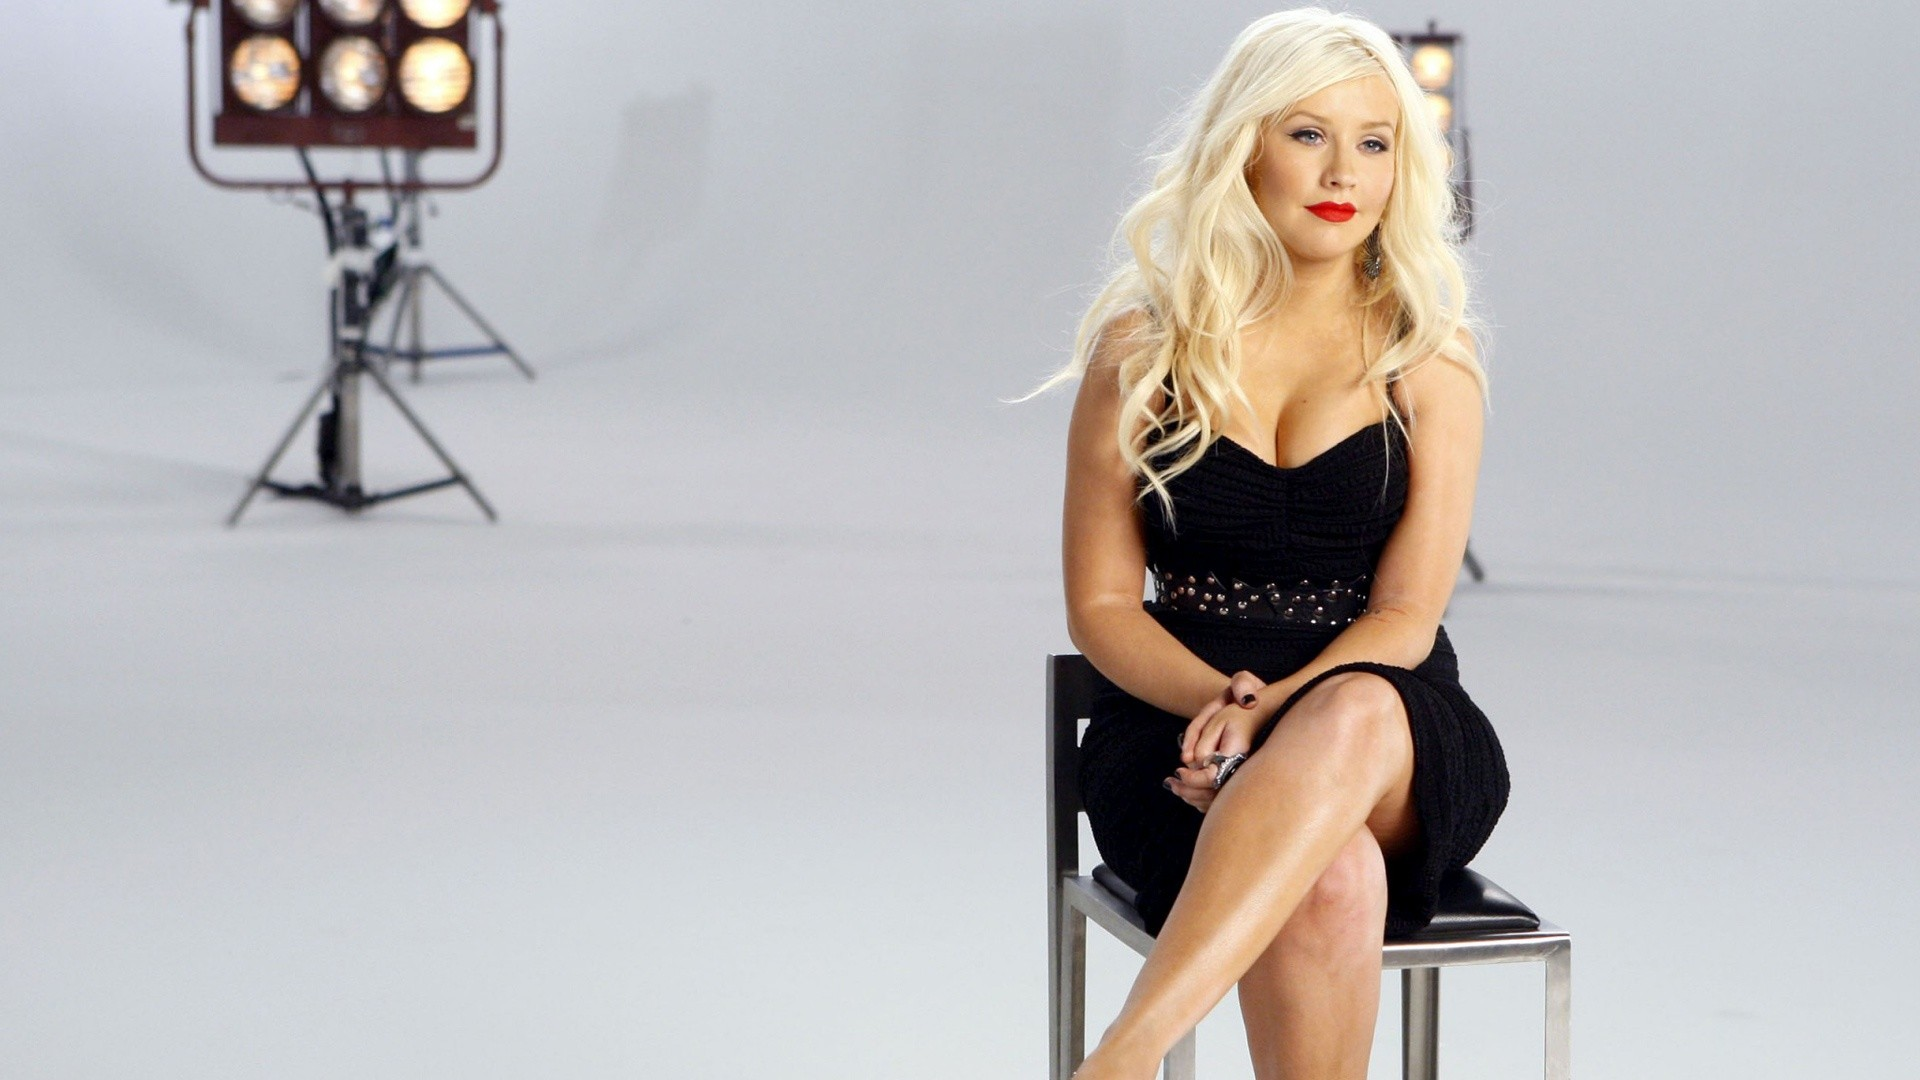 Christina Aguilera 2013 Christina Aguilera HD Wallpaper Christina 1920x1080